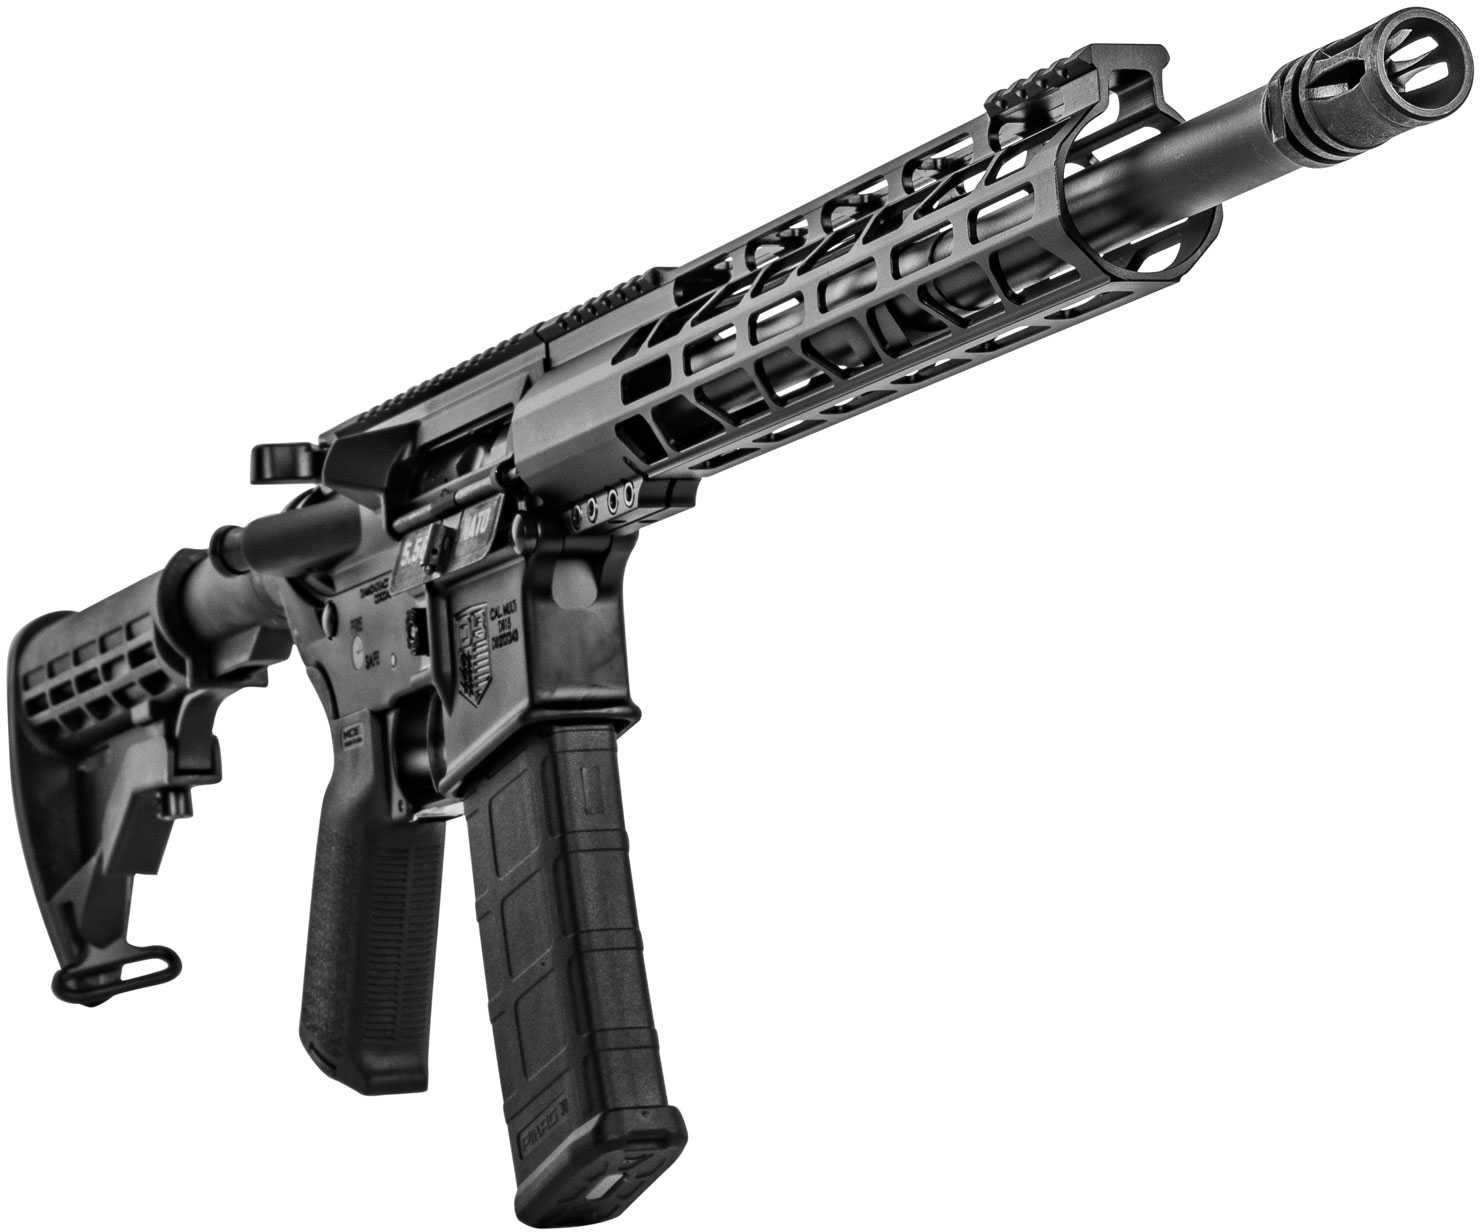 "Diamondback DB15 AR-15 Rifle 223 Rem 16"" Barrel 30 Round Black Nitride Black Hard Coat Anodized 6 Position Stock"